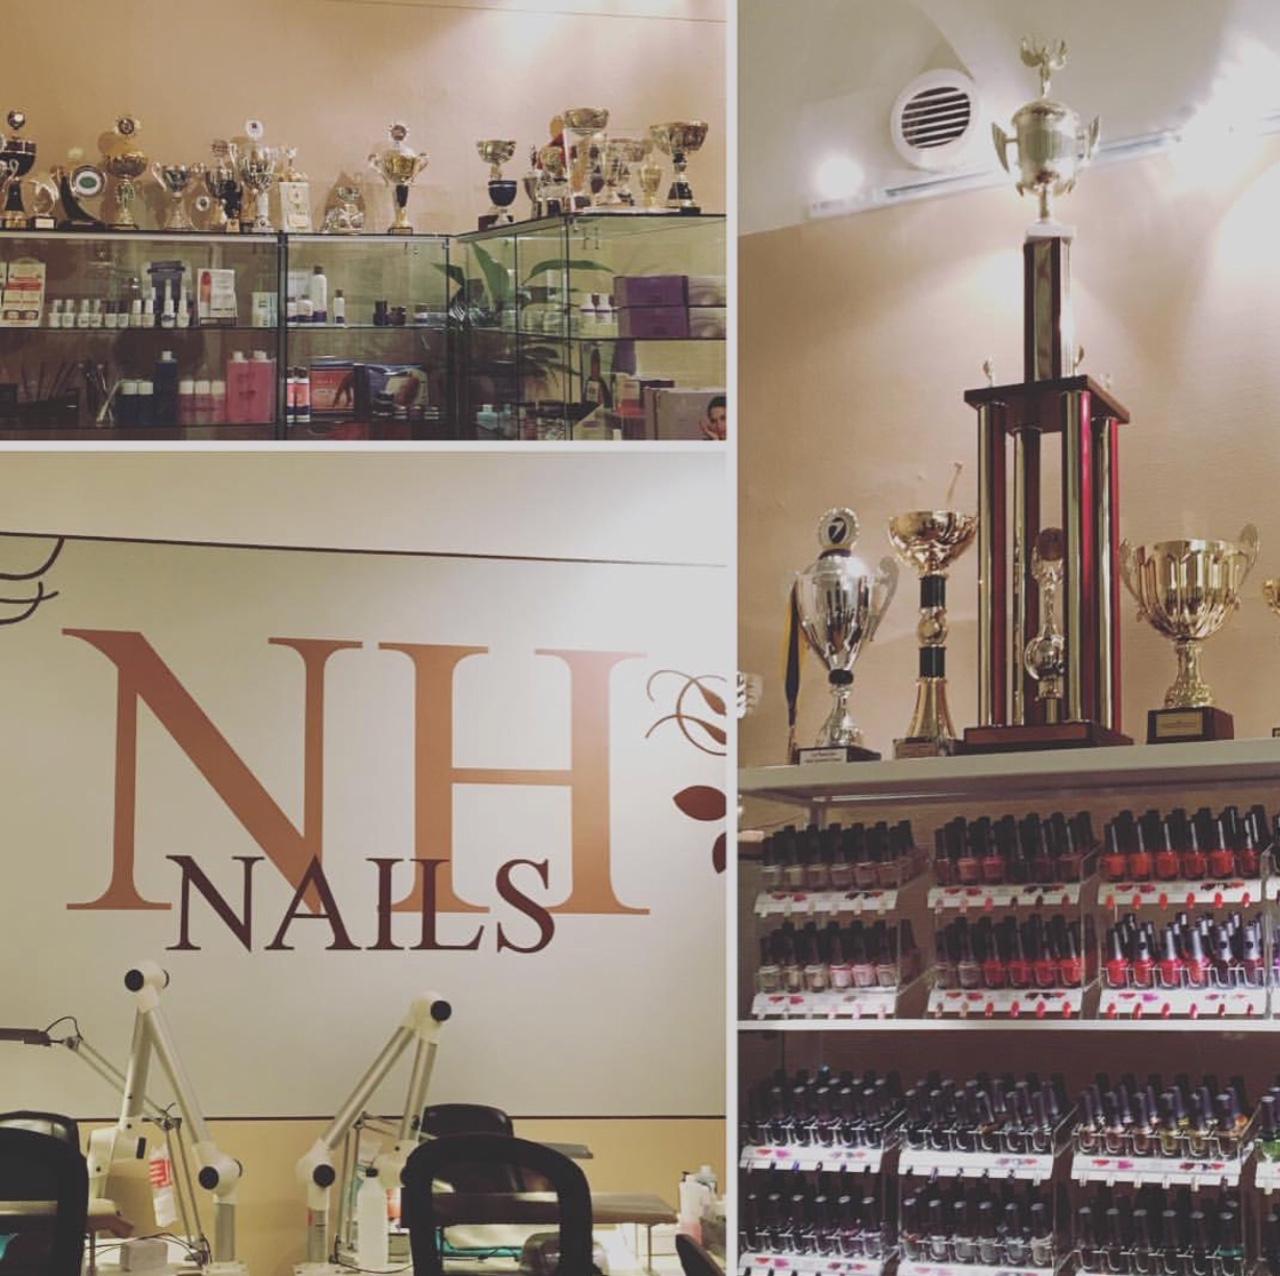 NH Nails c/o AB Najet Hamila